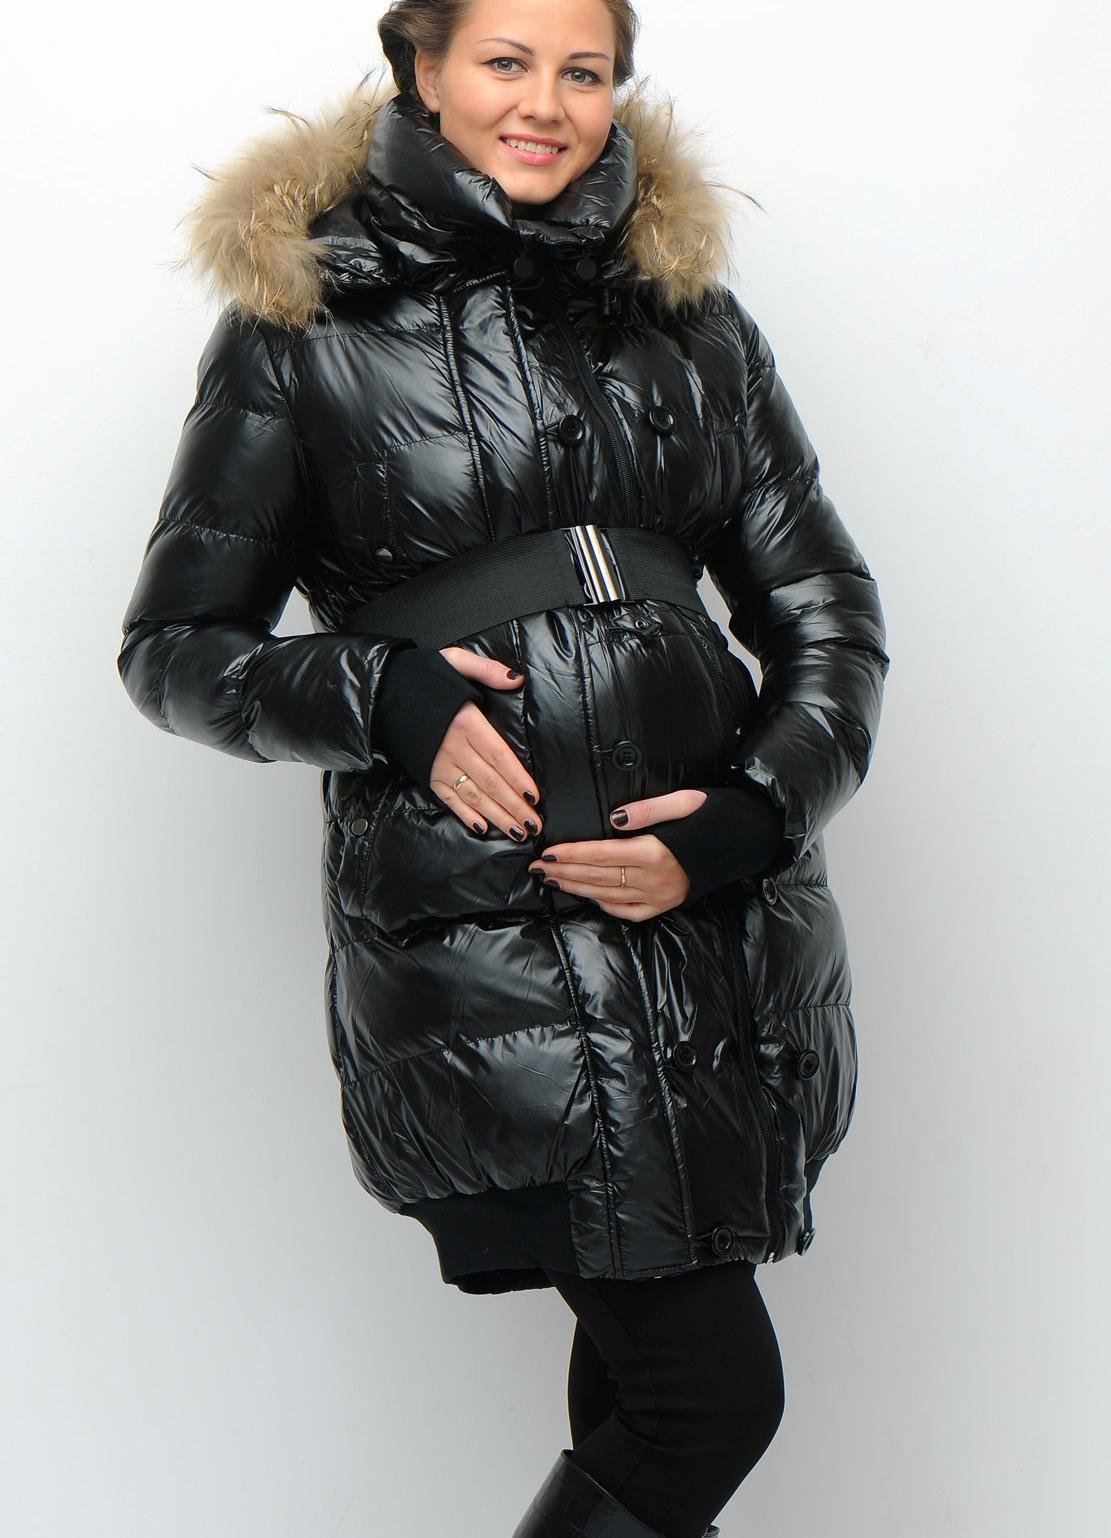 5e7c2d72e3a7 Пуховики для беременных (48 фото)  зимние, легкие, трапеция, со вставками